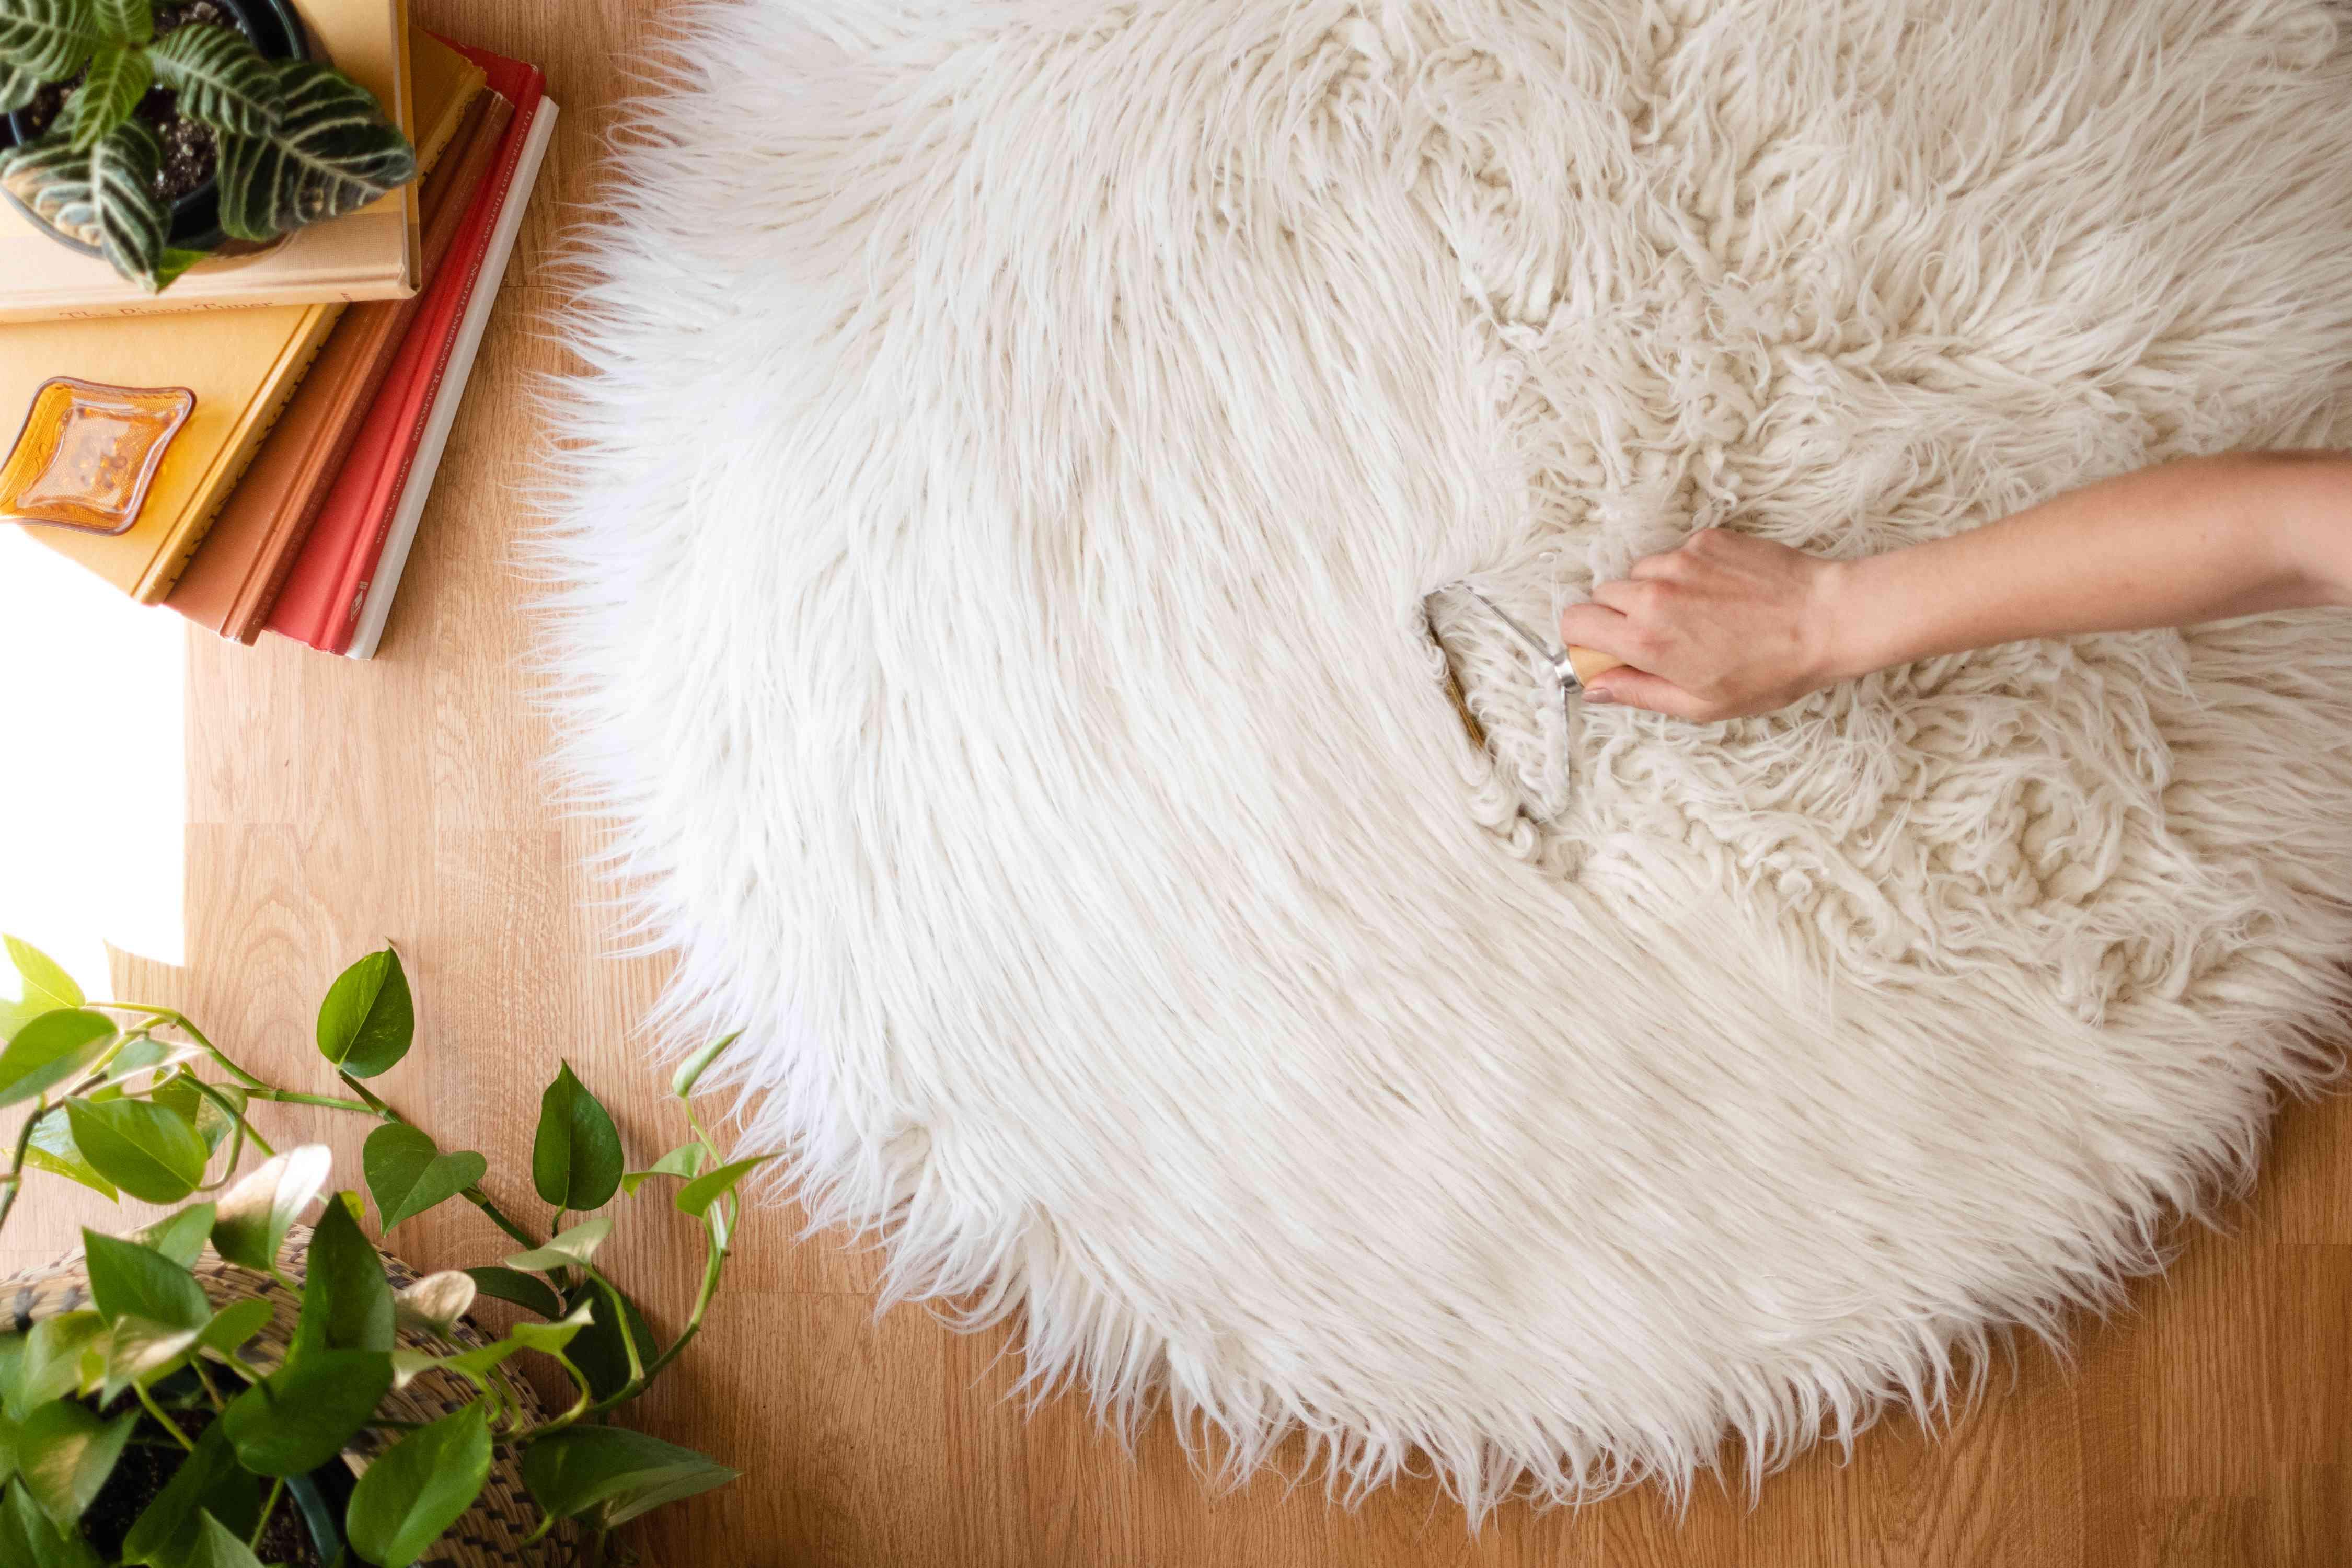 White shag rug pile lifted with carpet rake